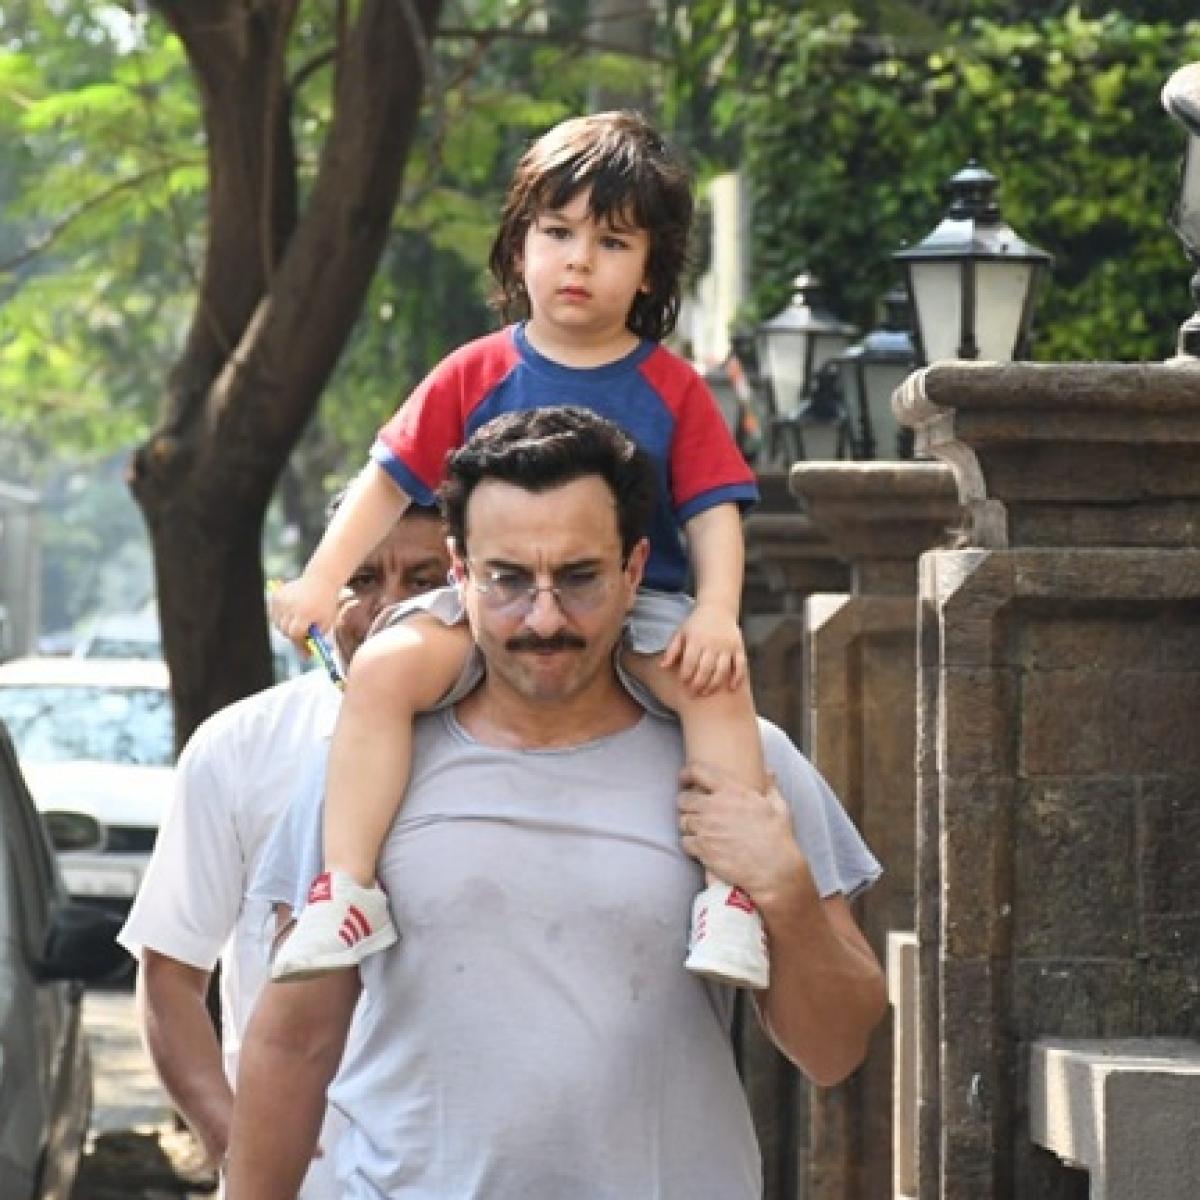 Kareena, Saif welcome second child: Taimur Ali Khan is 'delighted' as he turns elder brother, says Randhir Kapoor